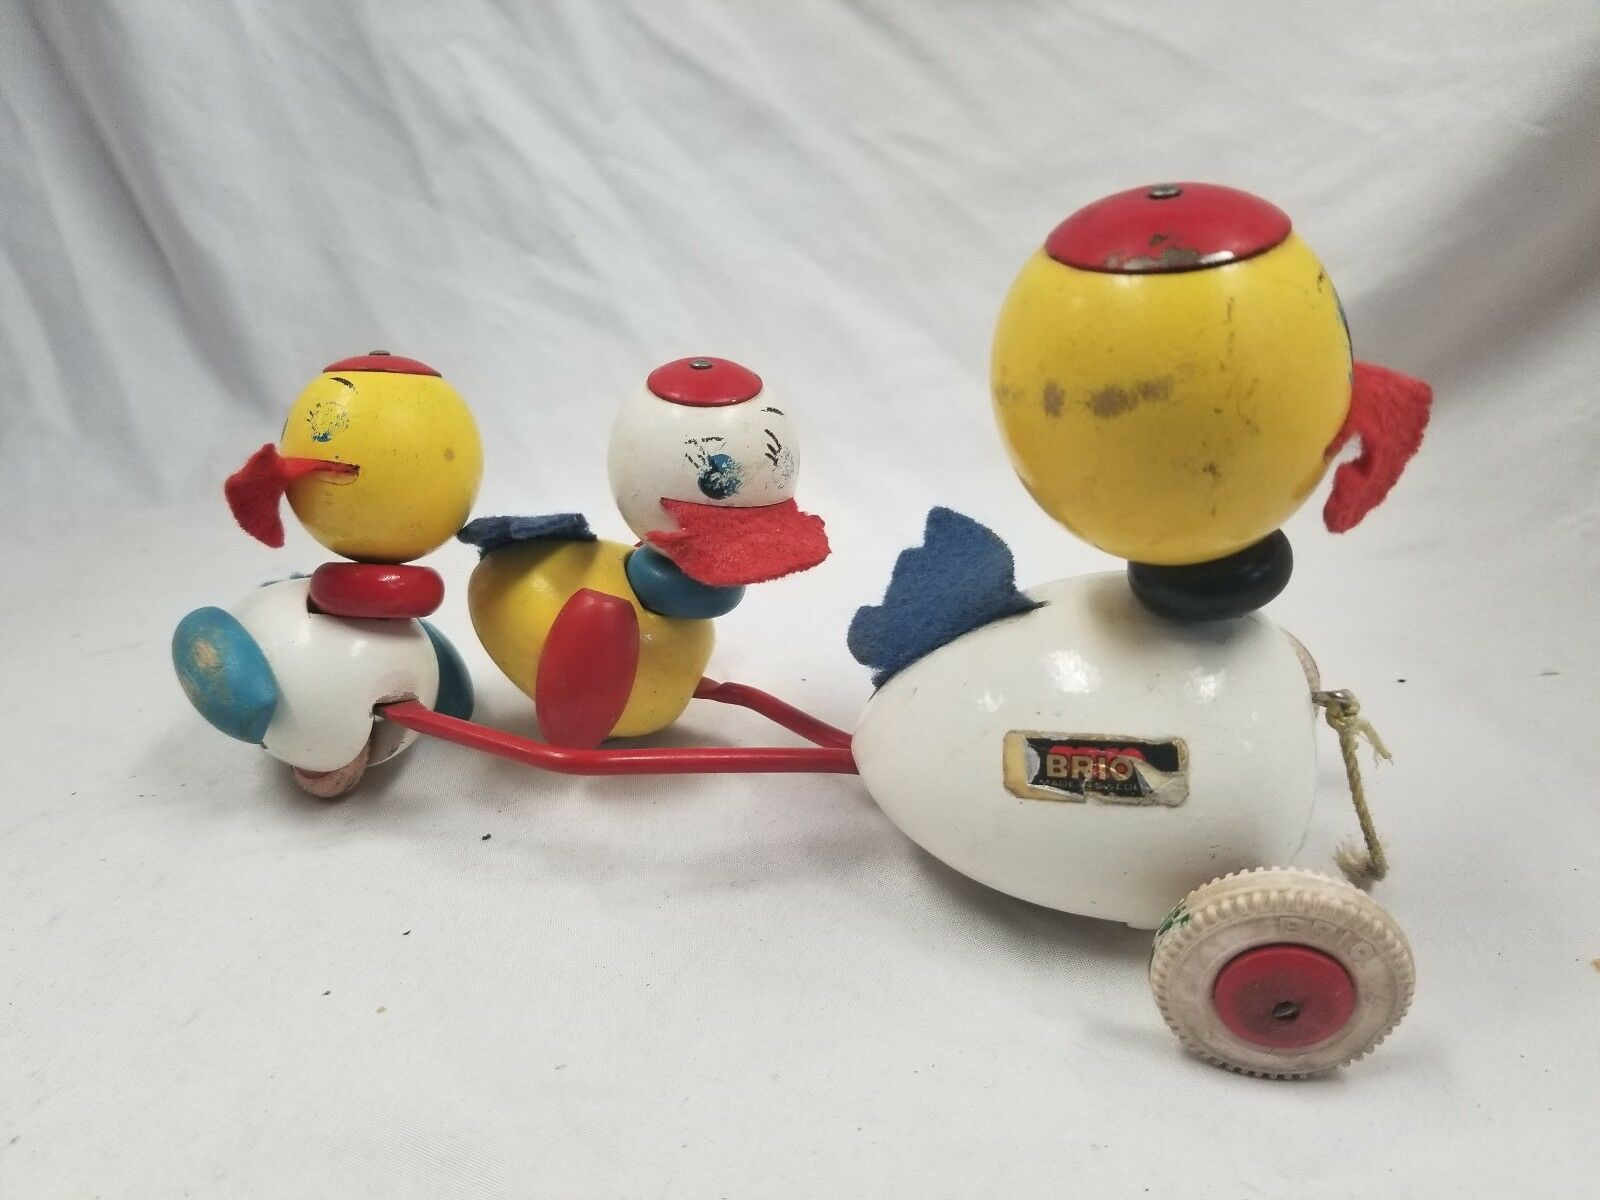 Vintage Brio Wood Duck Pull Toy